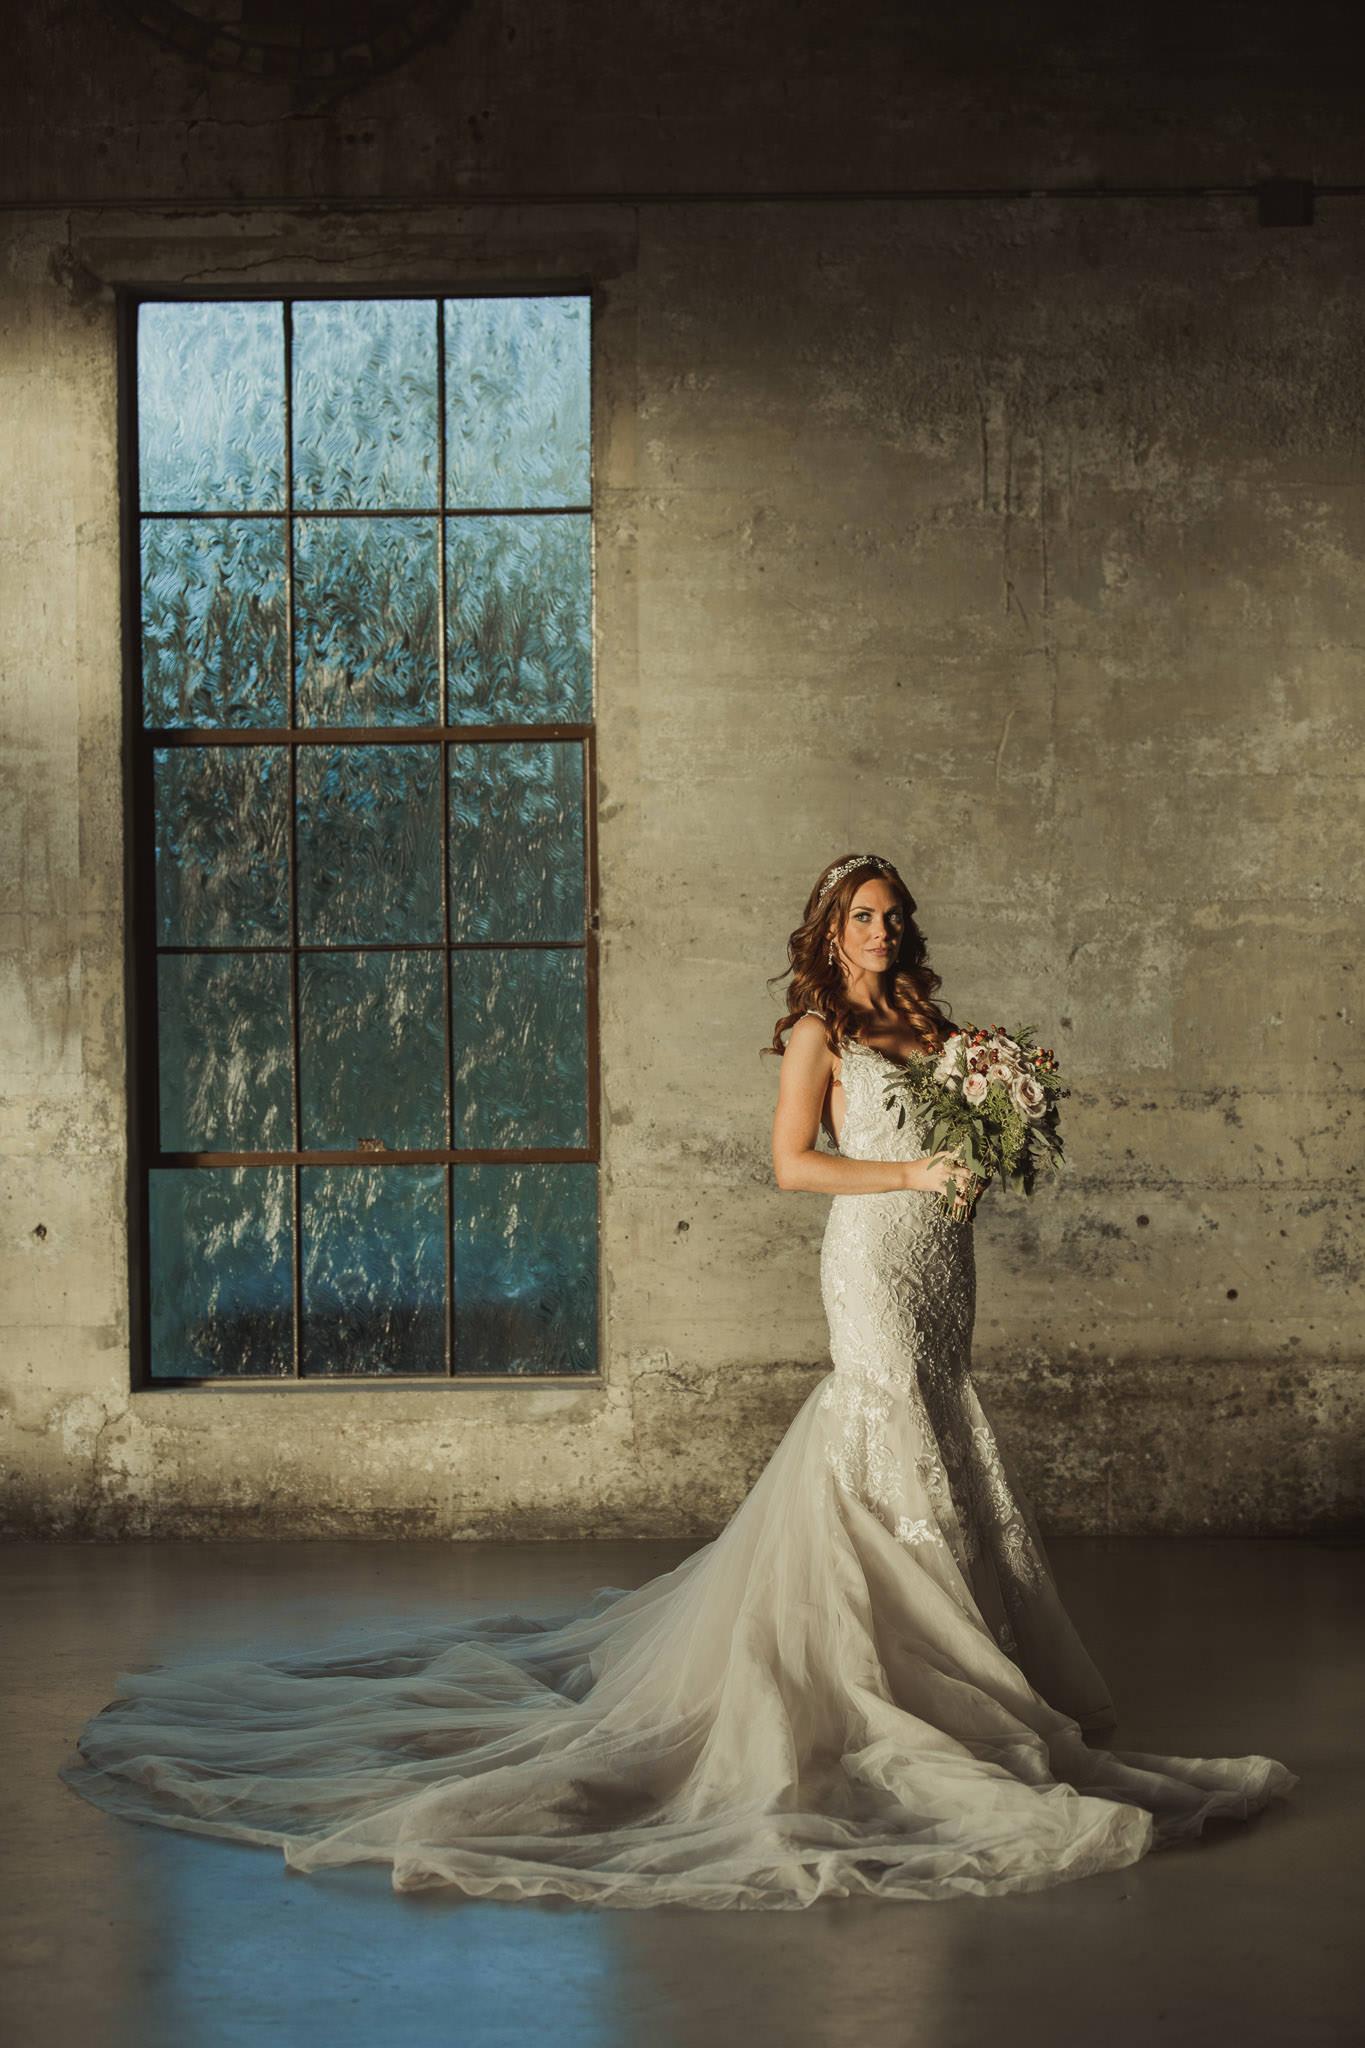 Cynthia-Curtis-Olde-Dobbine-Station-Houston-Wedding-Photographer-sm-60.jpg